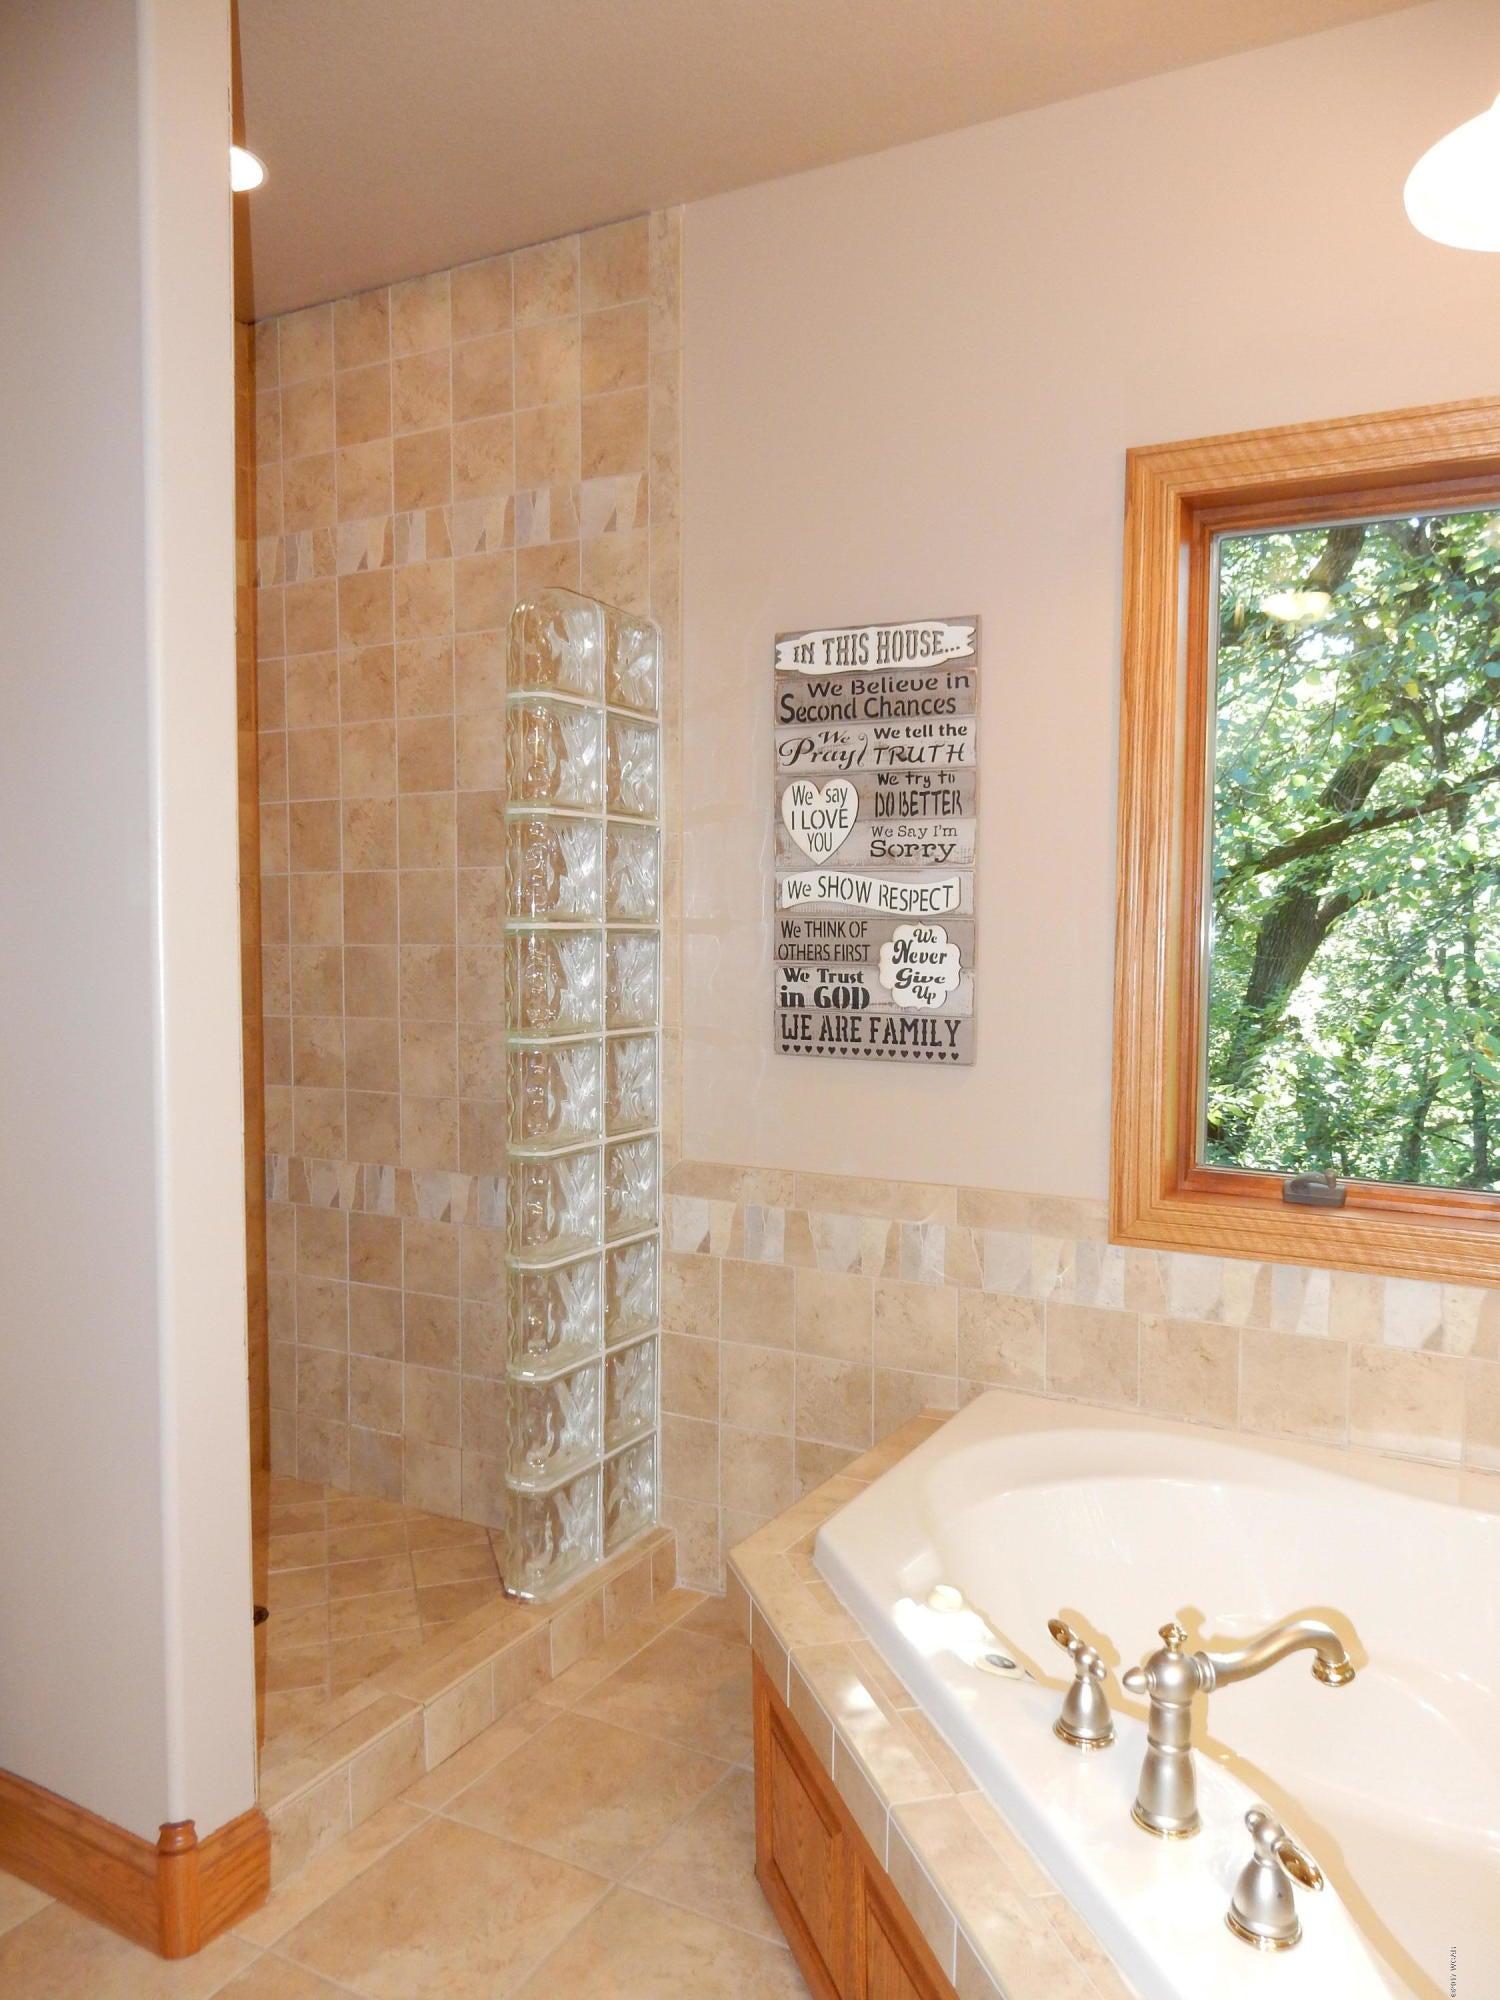 7438 Point Lake Drive,Willmar,5 Bedrooms Bedrooms,4 BathroomsBathrooms,Single Family,Point Lake Drive,6029892